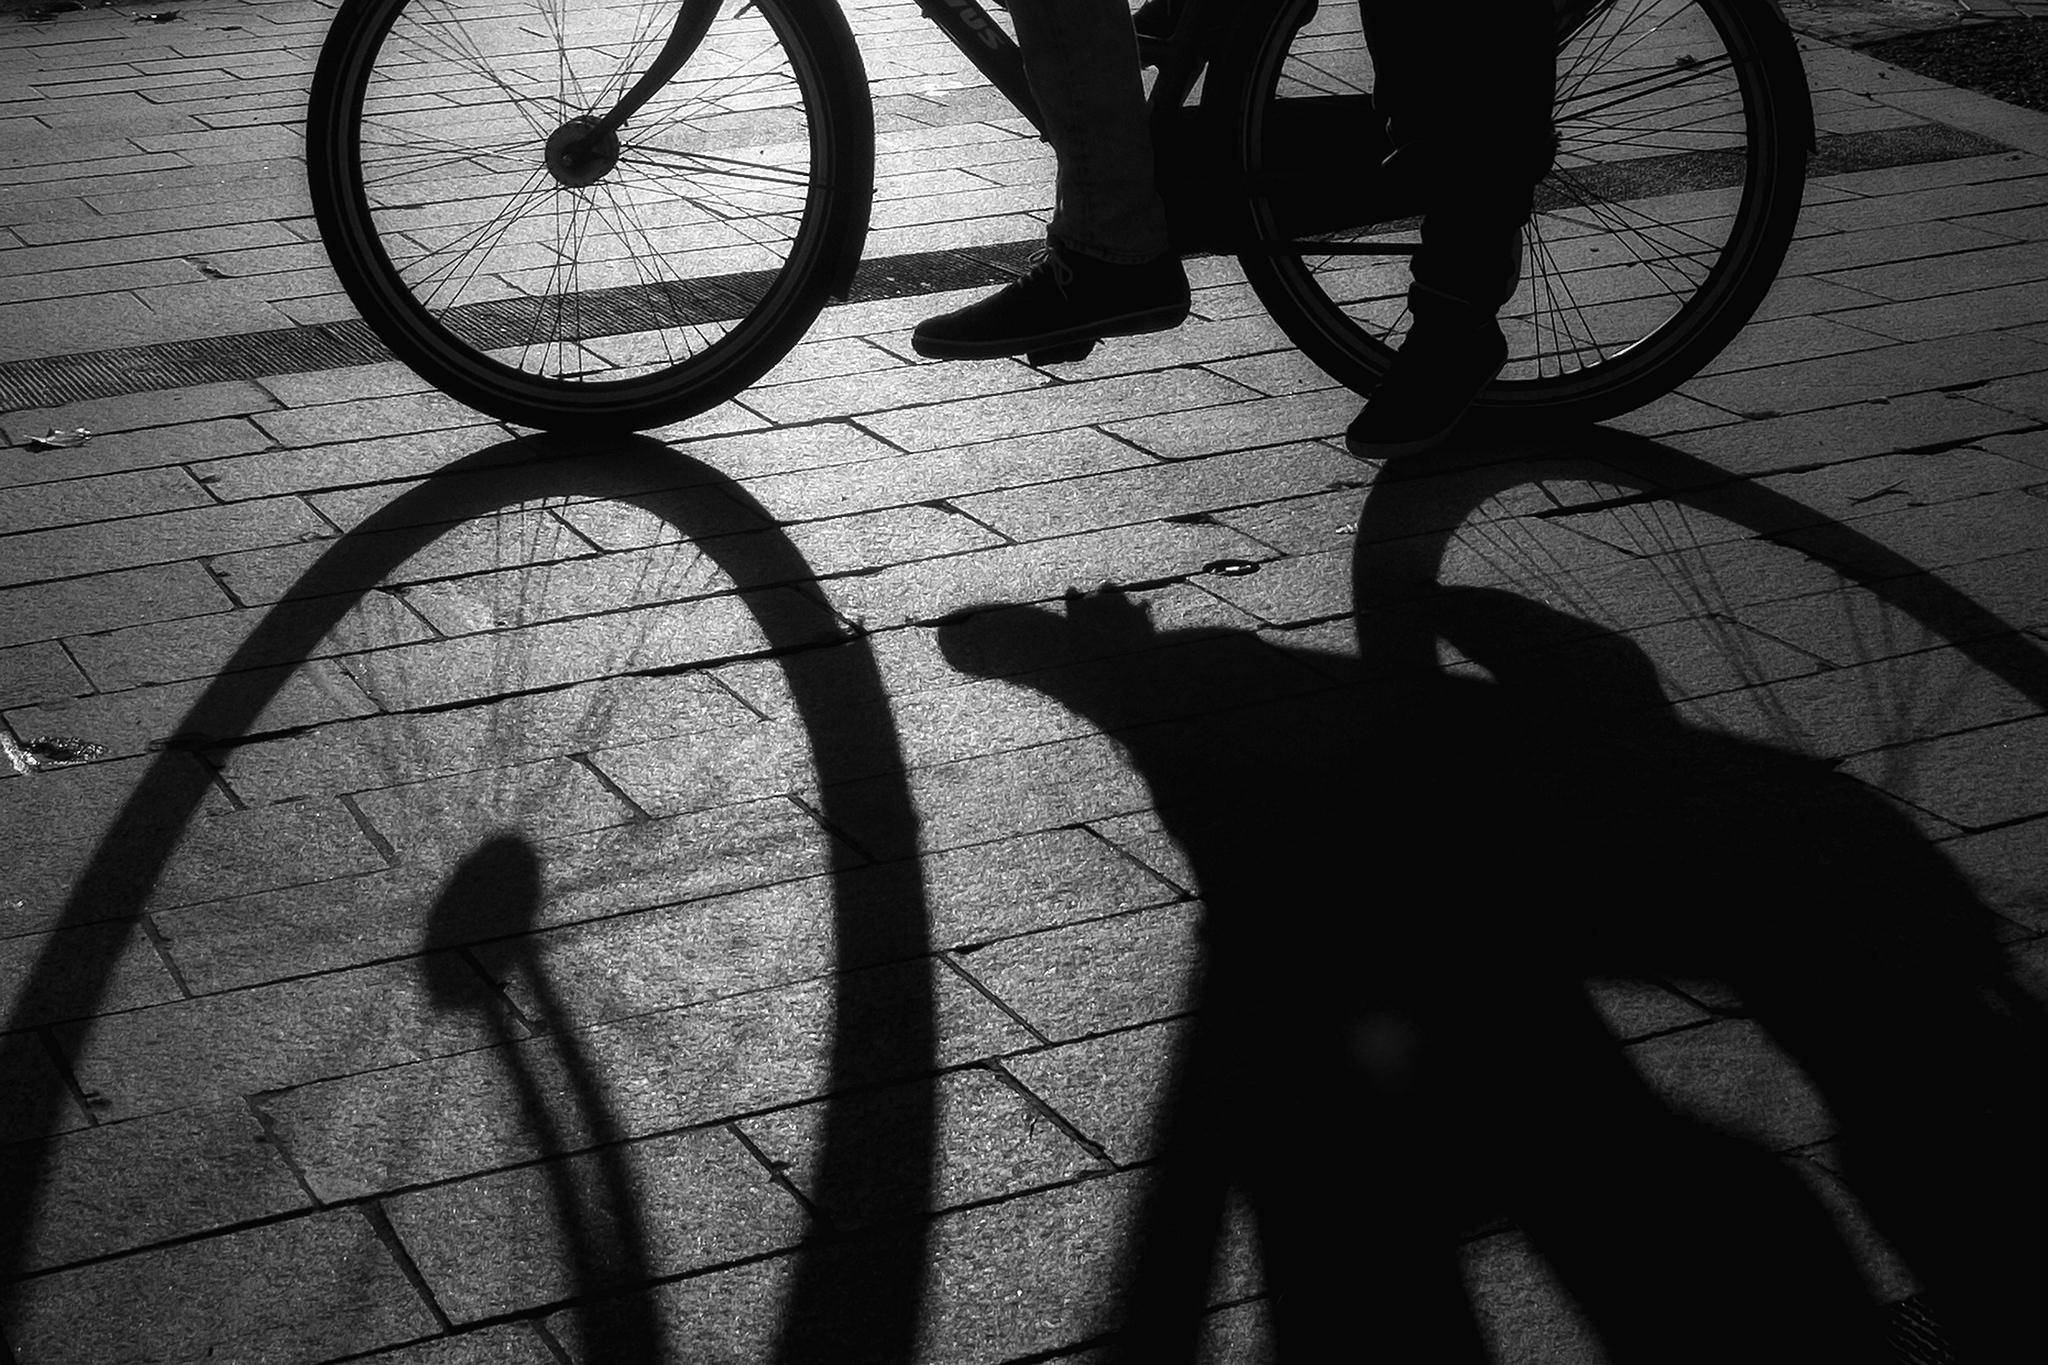 fiets fietsers ochtendzon zwartwit Cyril Wermers